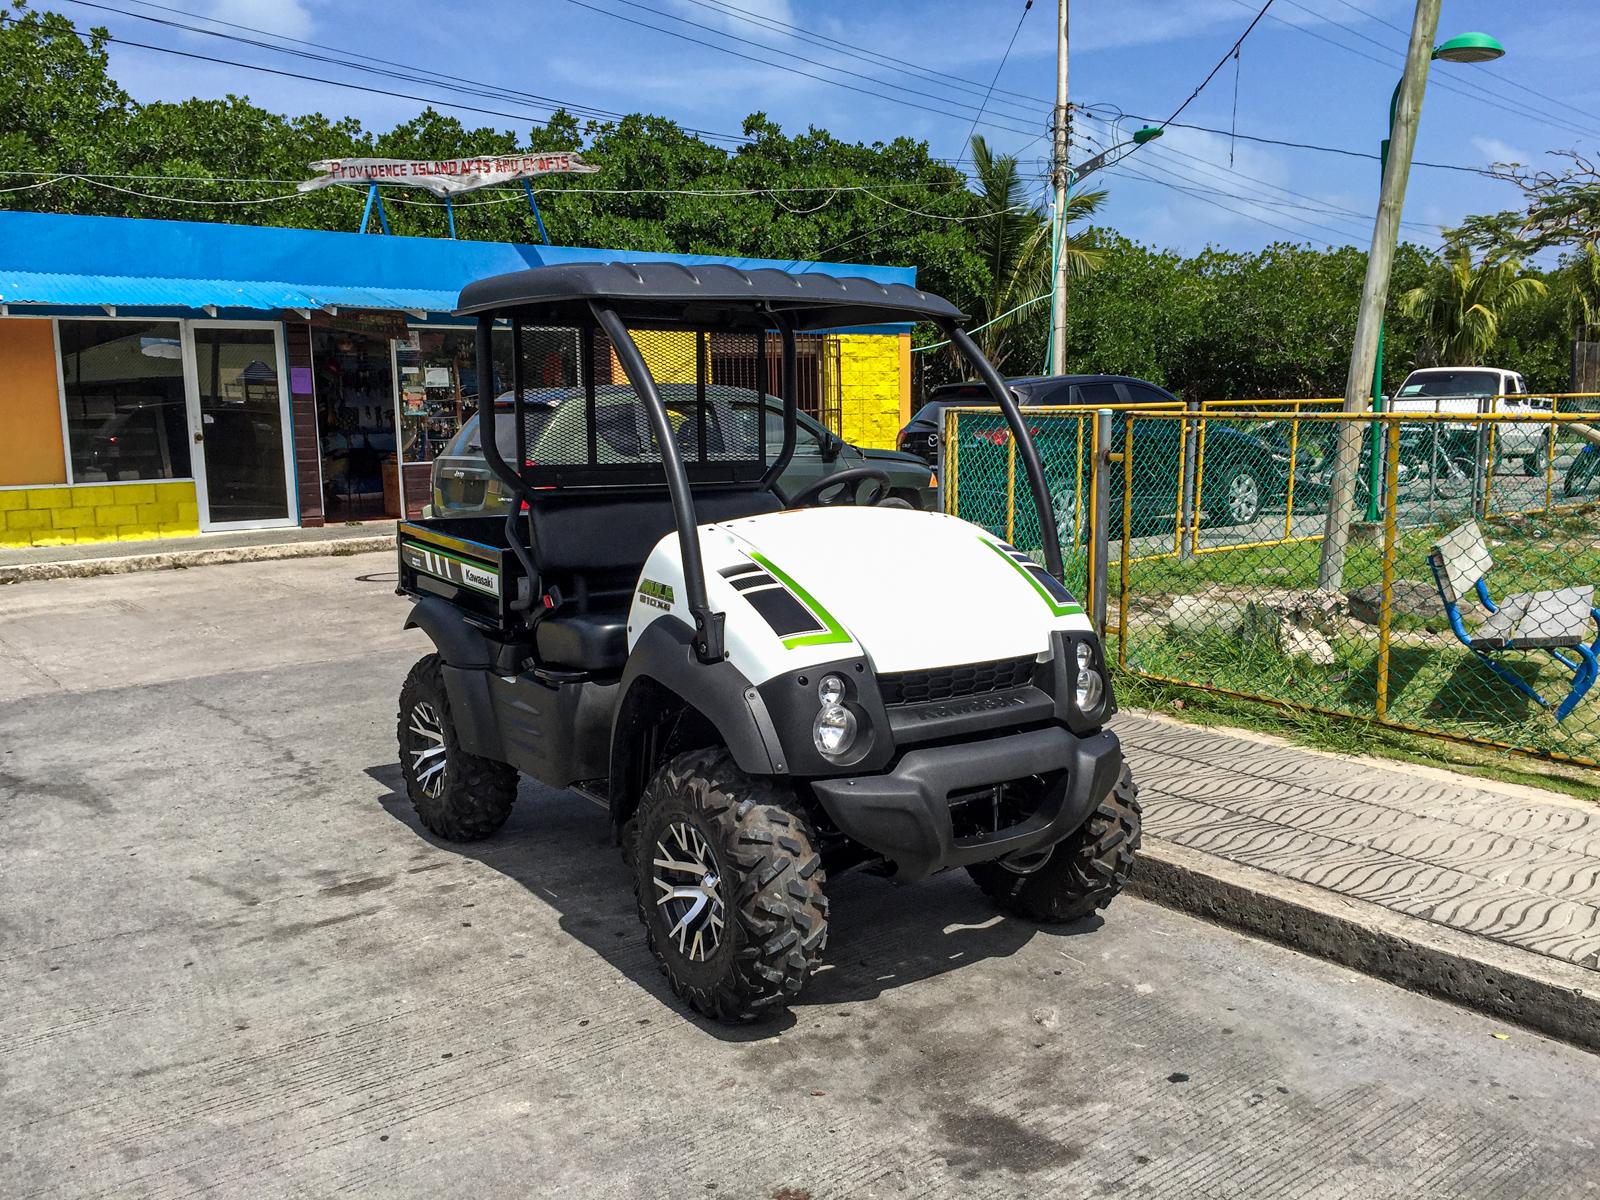 My golf cart rental